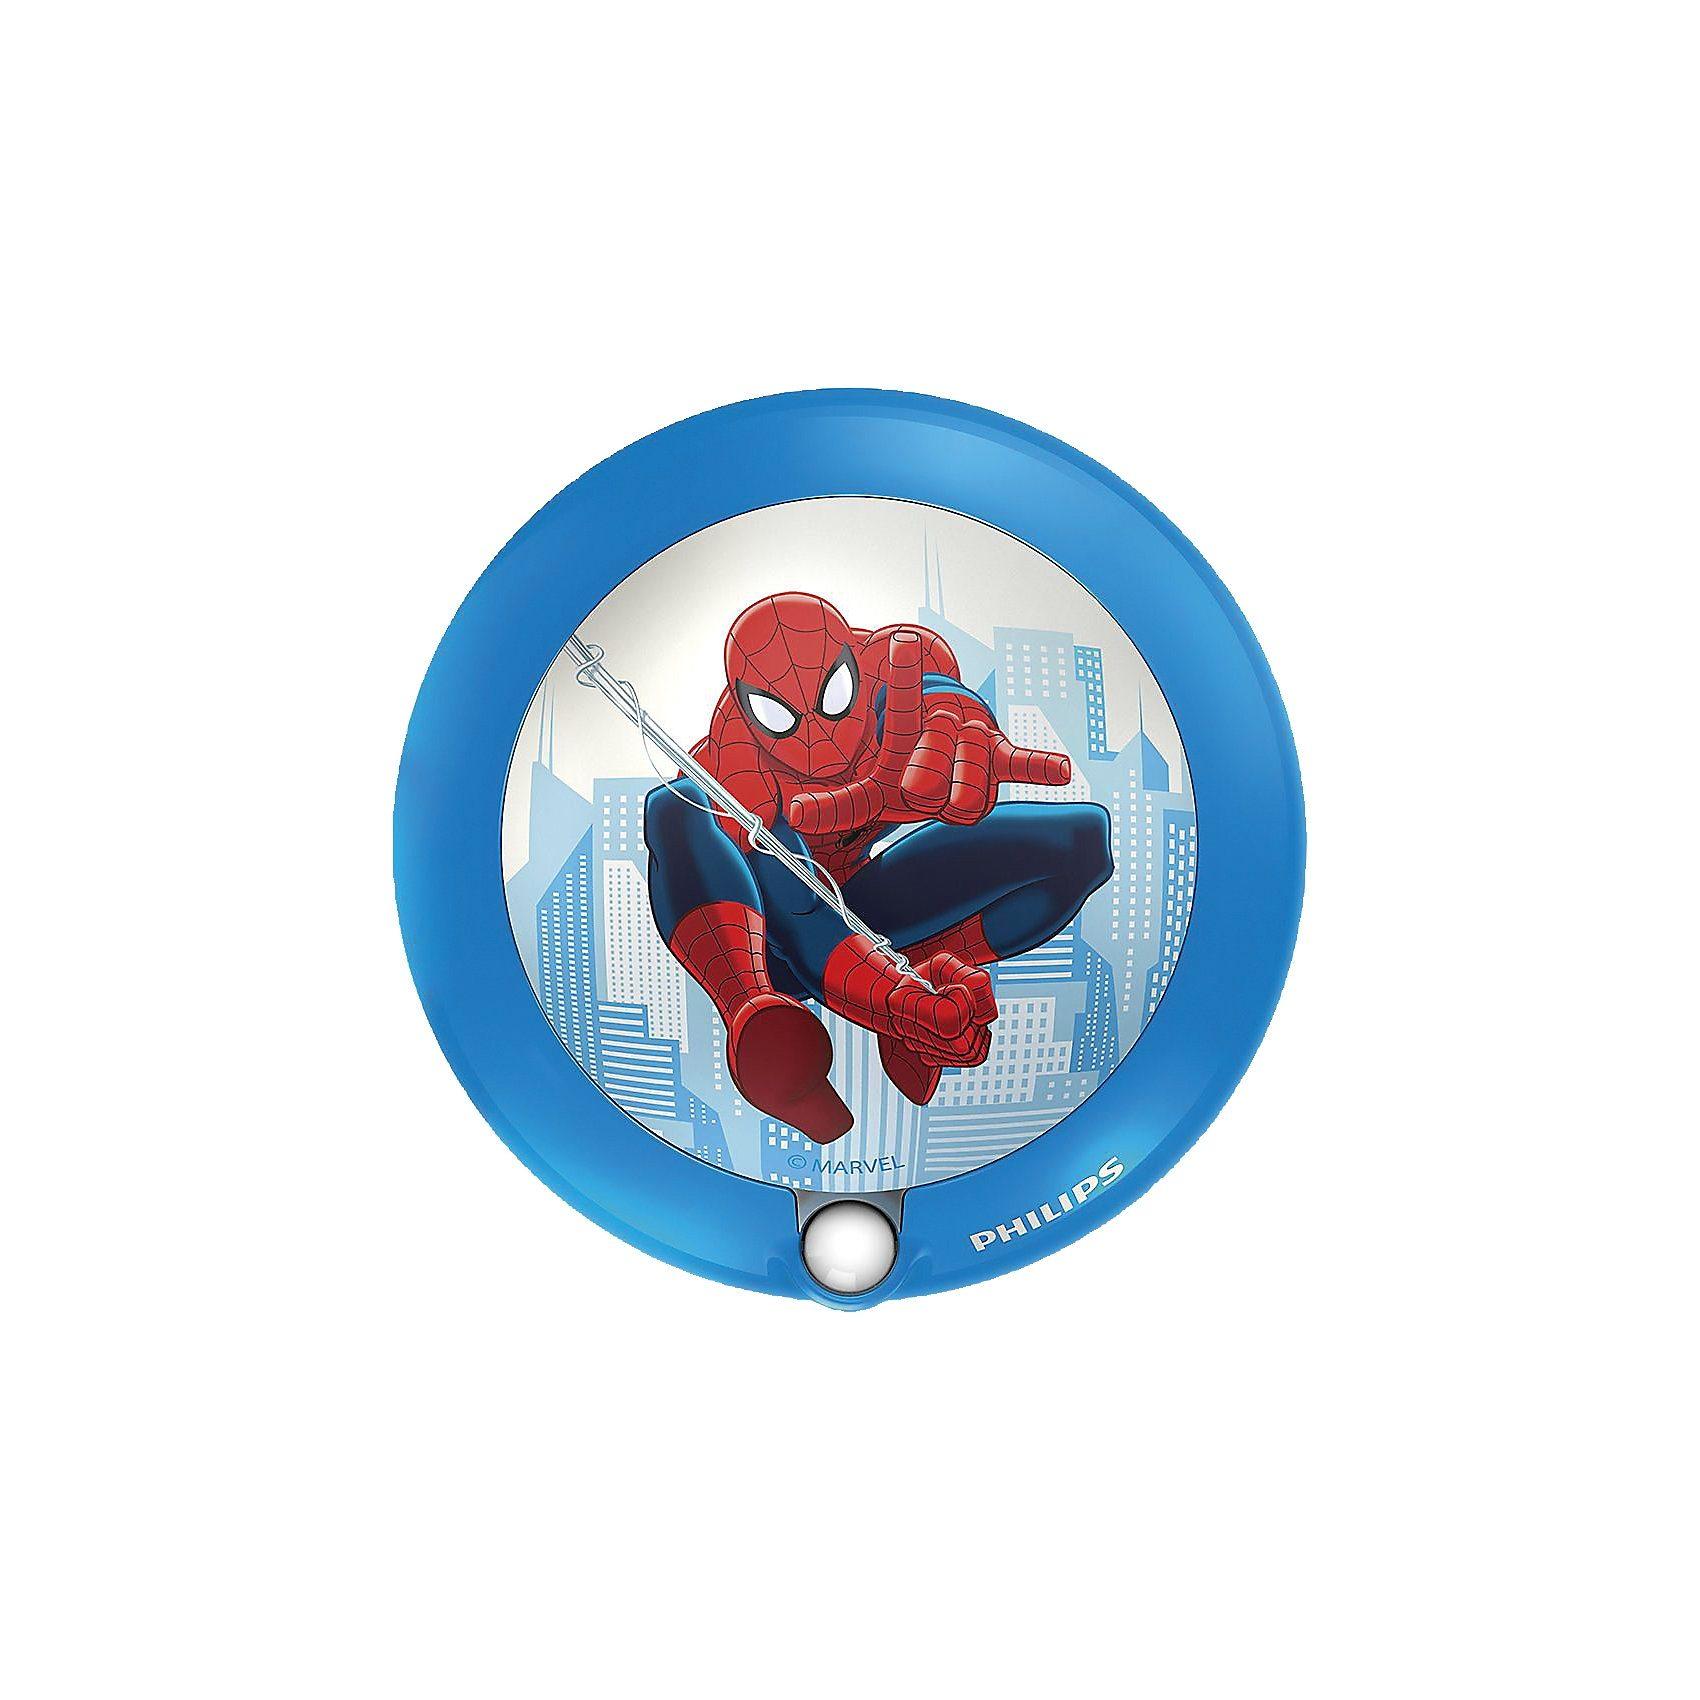 Philips Lighting SpotOn, Spiderman, LED